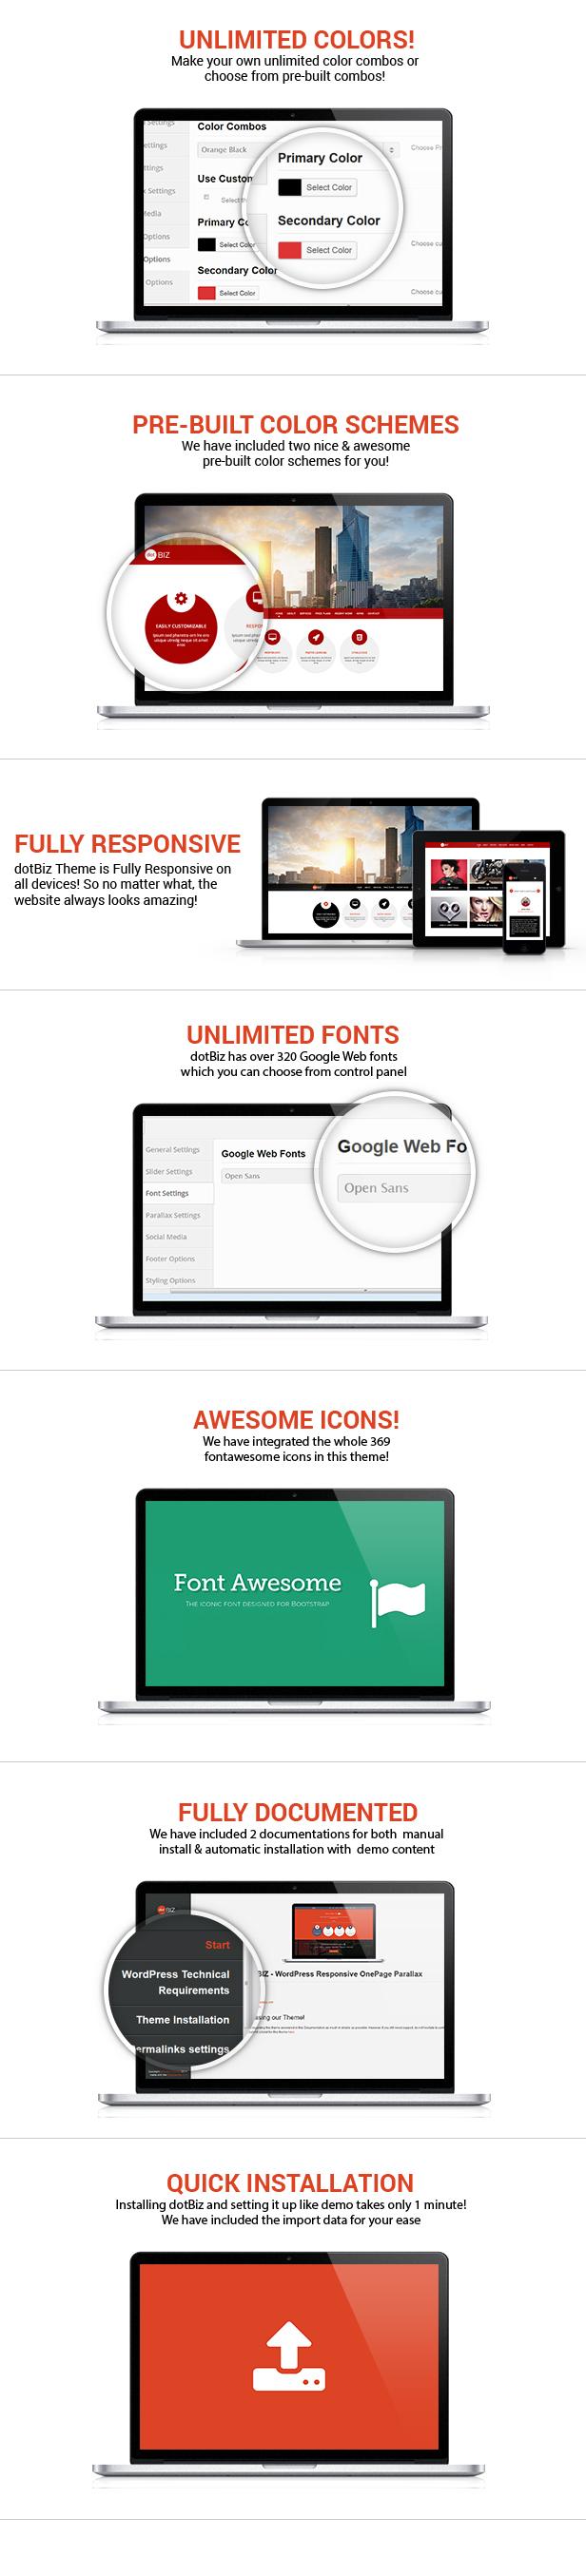 dotBIZ - WordPress Responsive OnePage Parallax  - 5